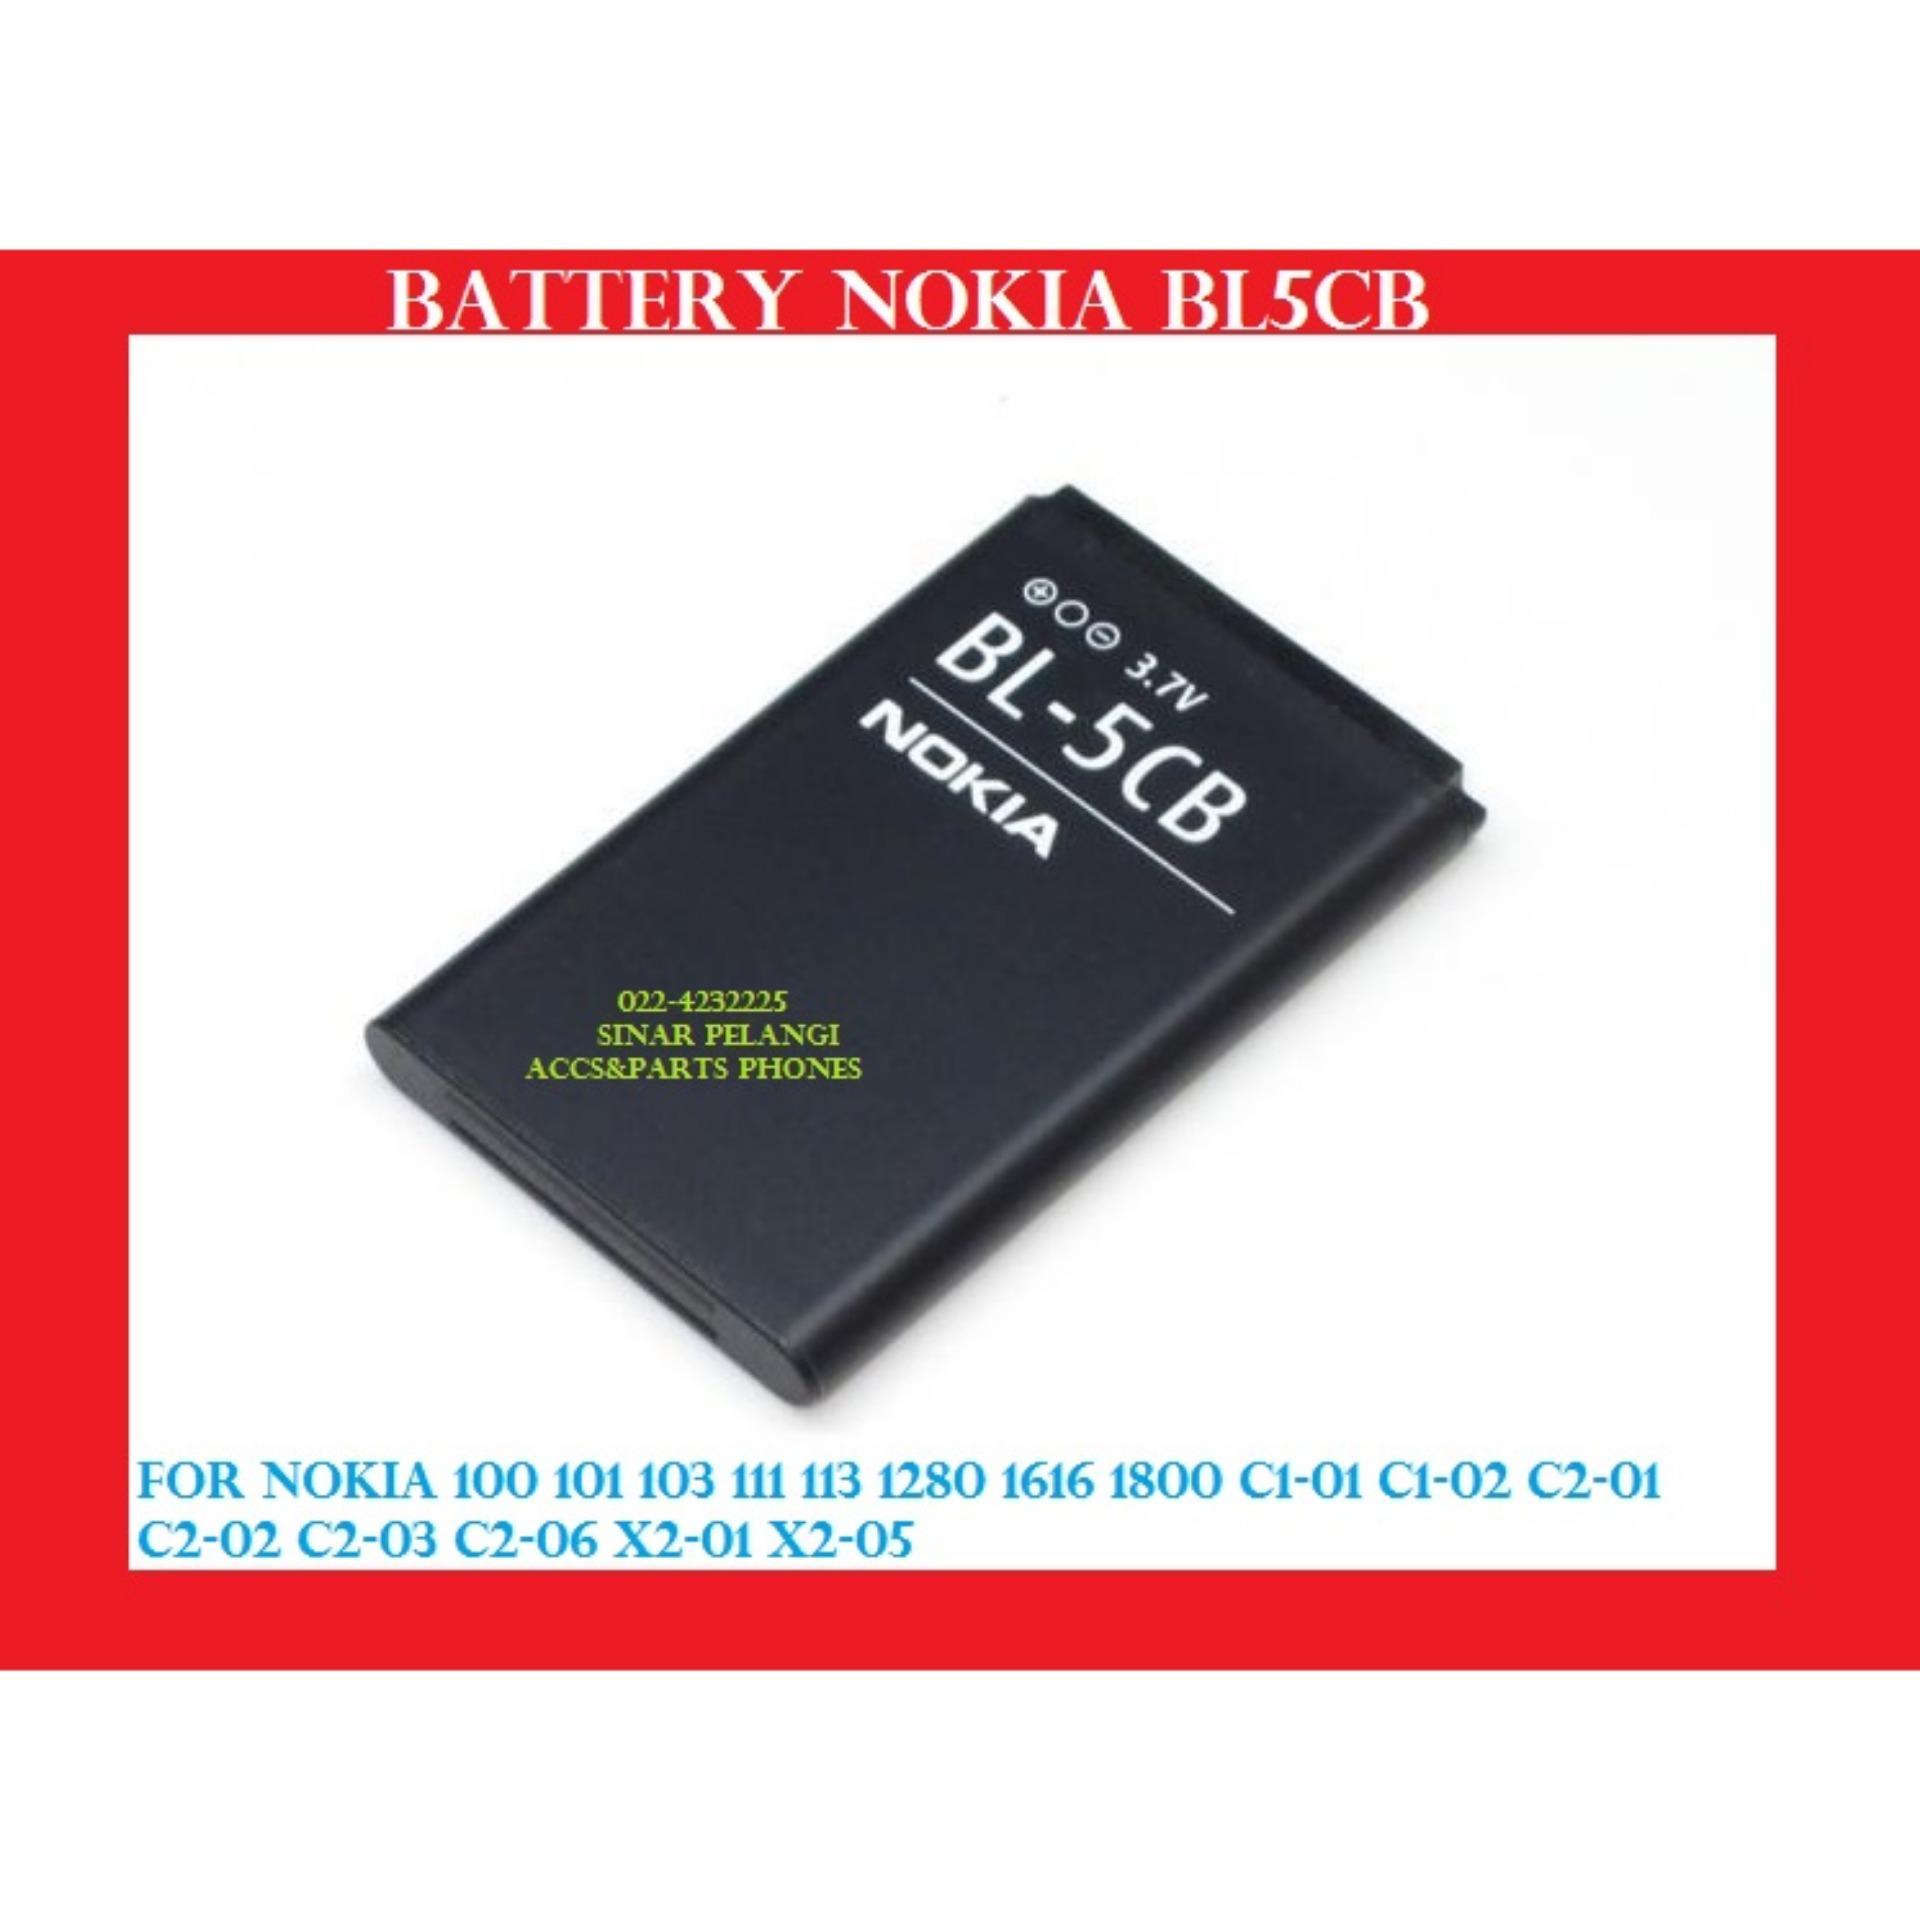 Garansi Ganti Baru 800 Mah Battery Batre Baterai Nokia Bl5cb 100329